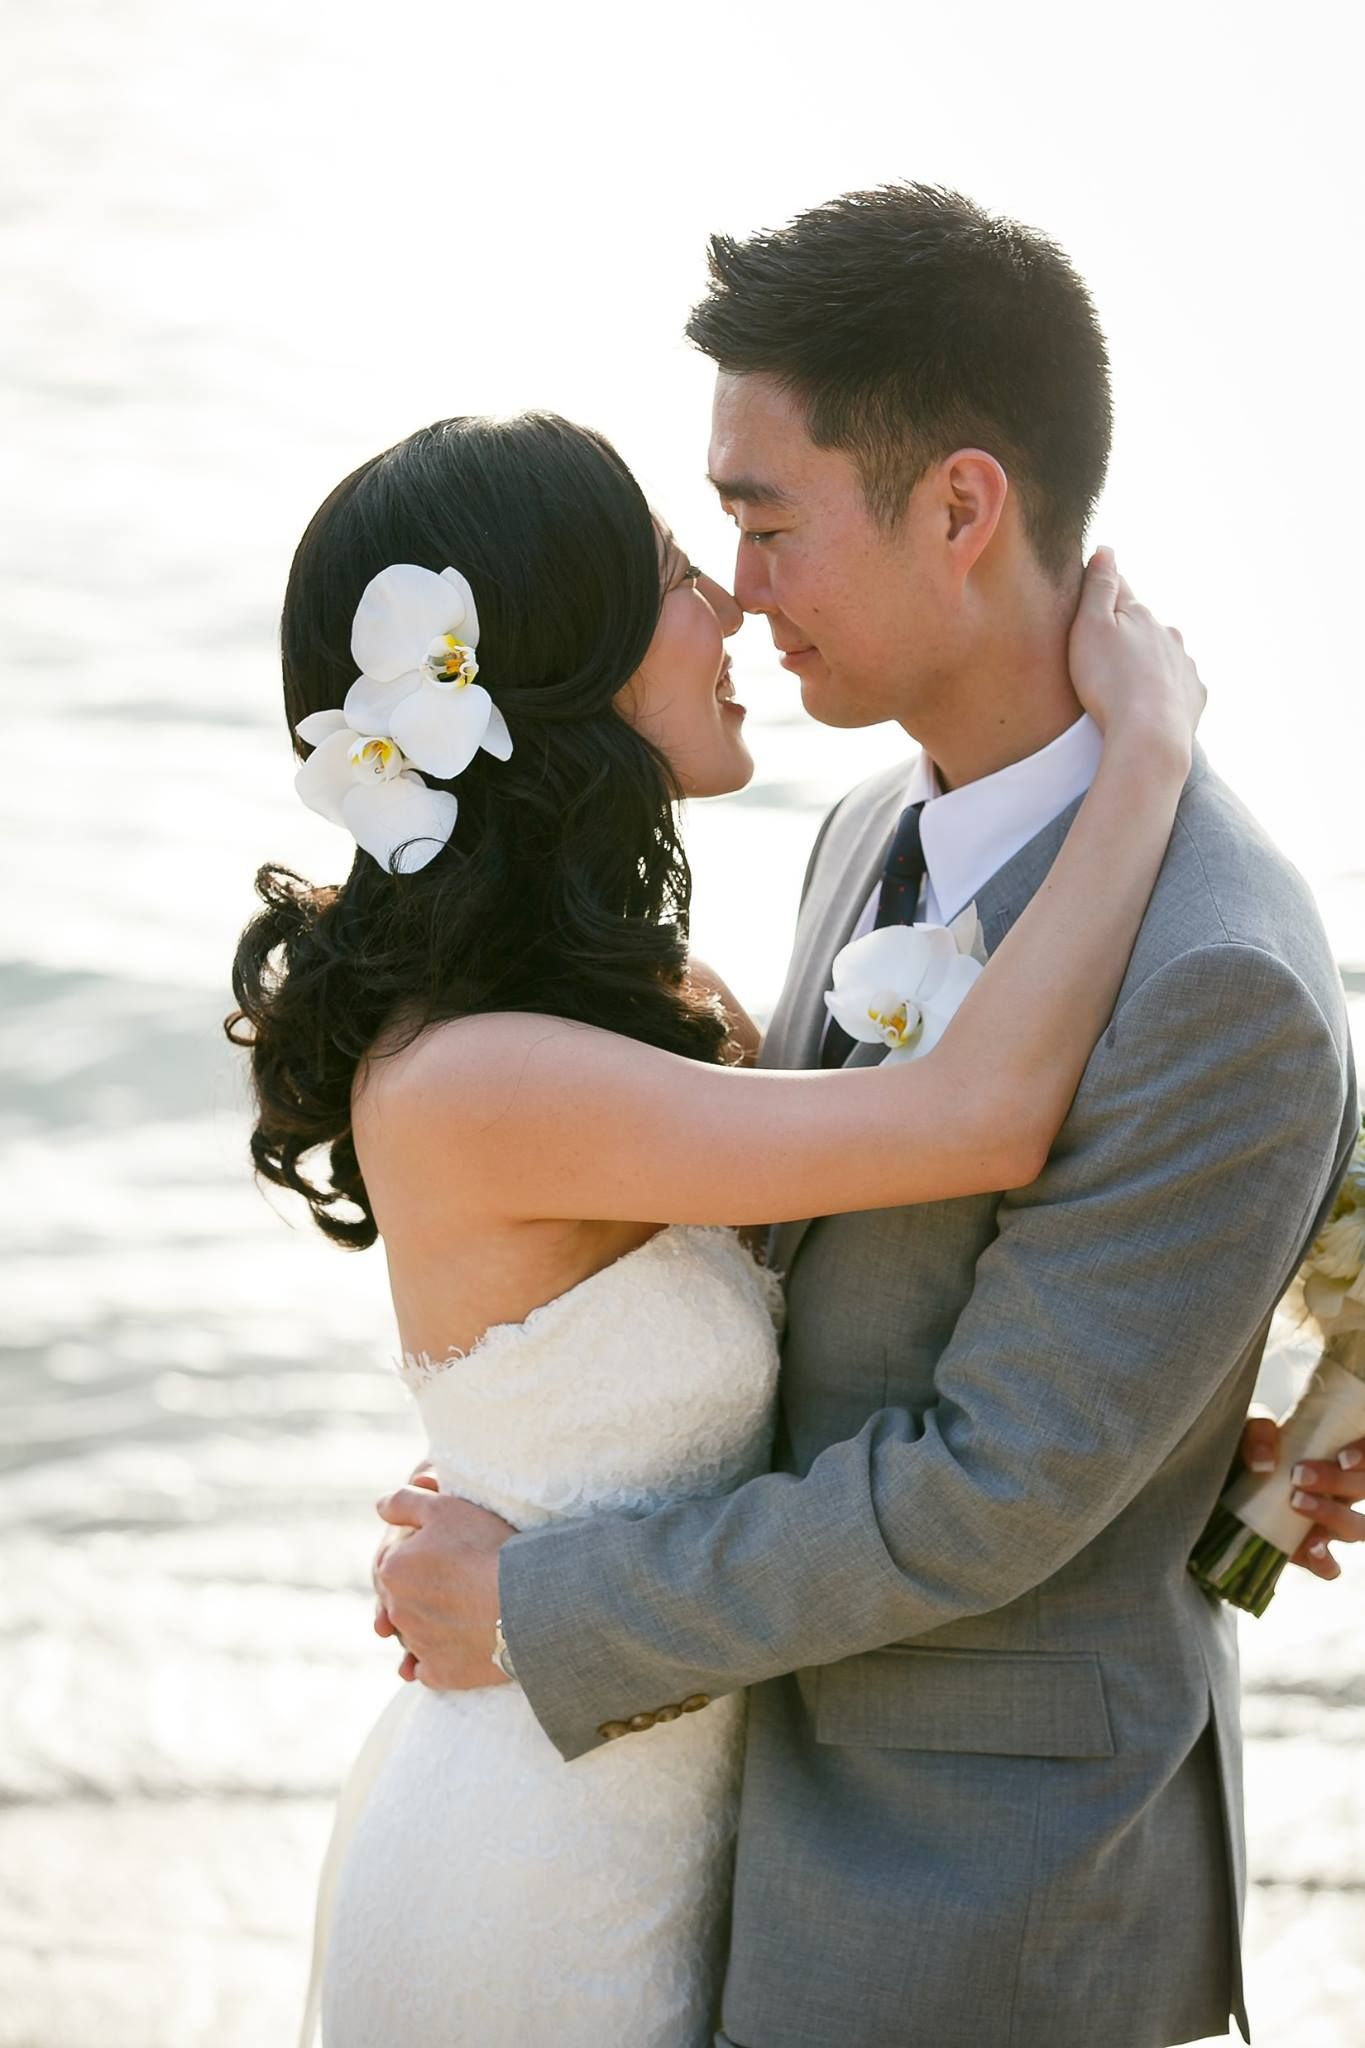 side pony asian hair orchids beach wedding hawaii whik'd